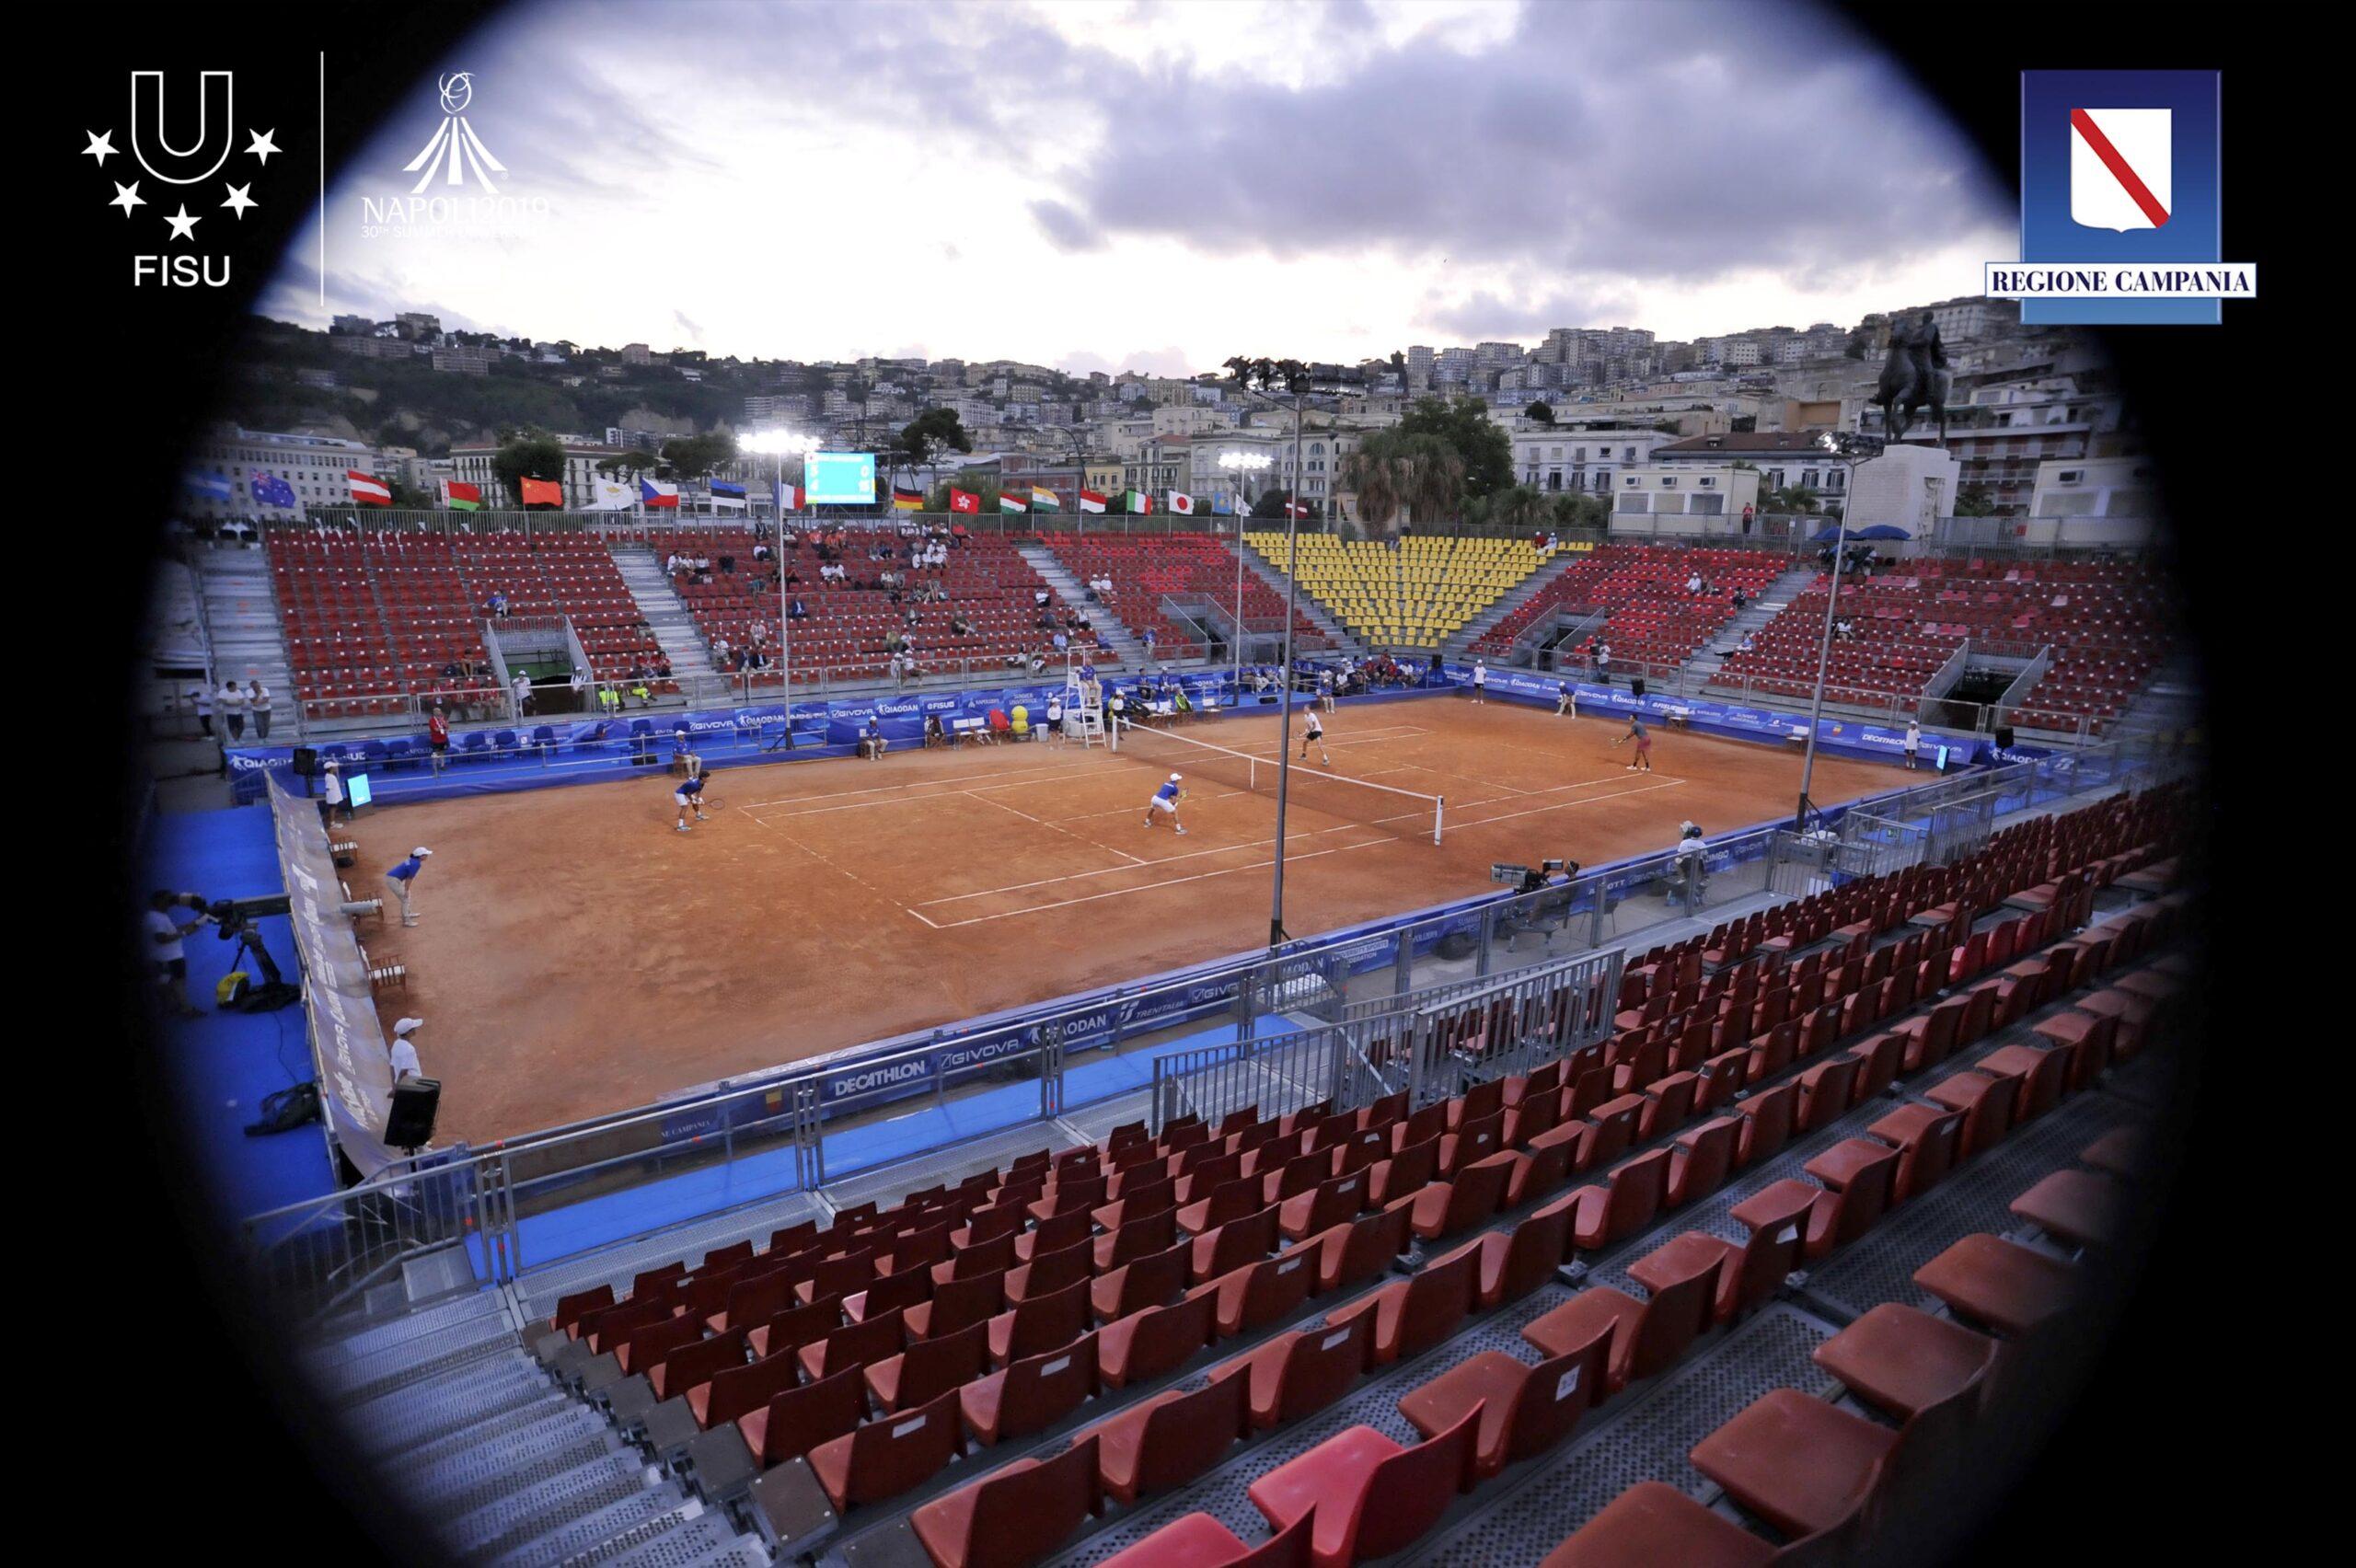 Finale tennis doppio Maschile KOR-UZB Tennis Club Napoli Credit: Pool fotografi universiadi